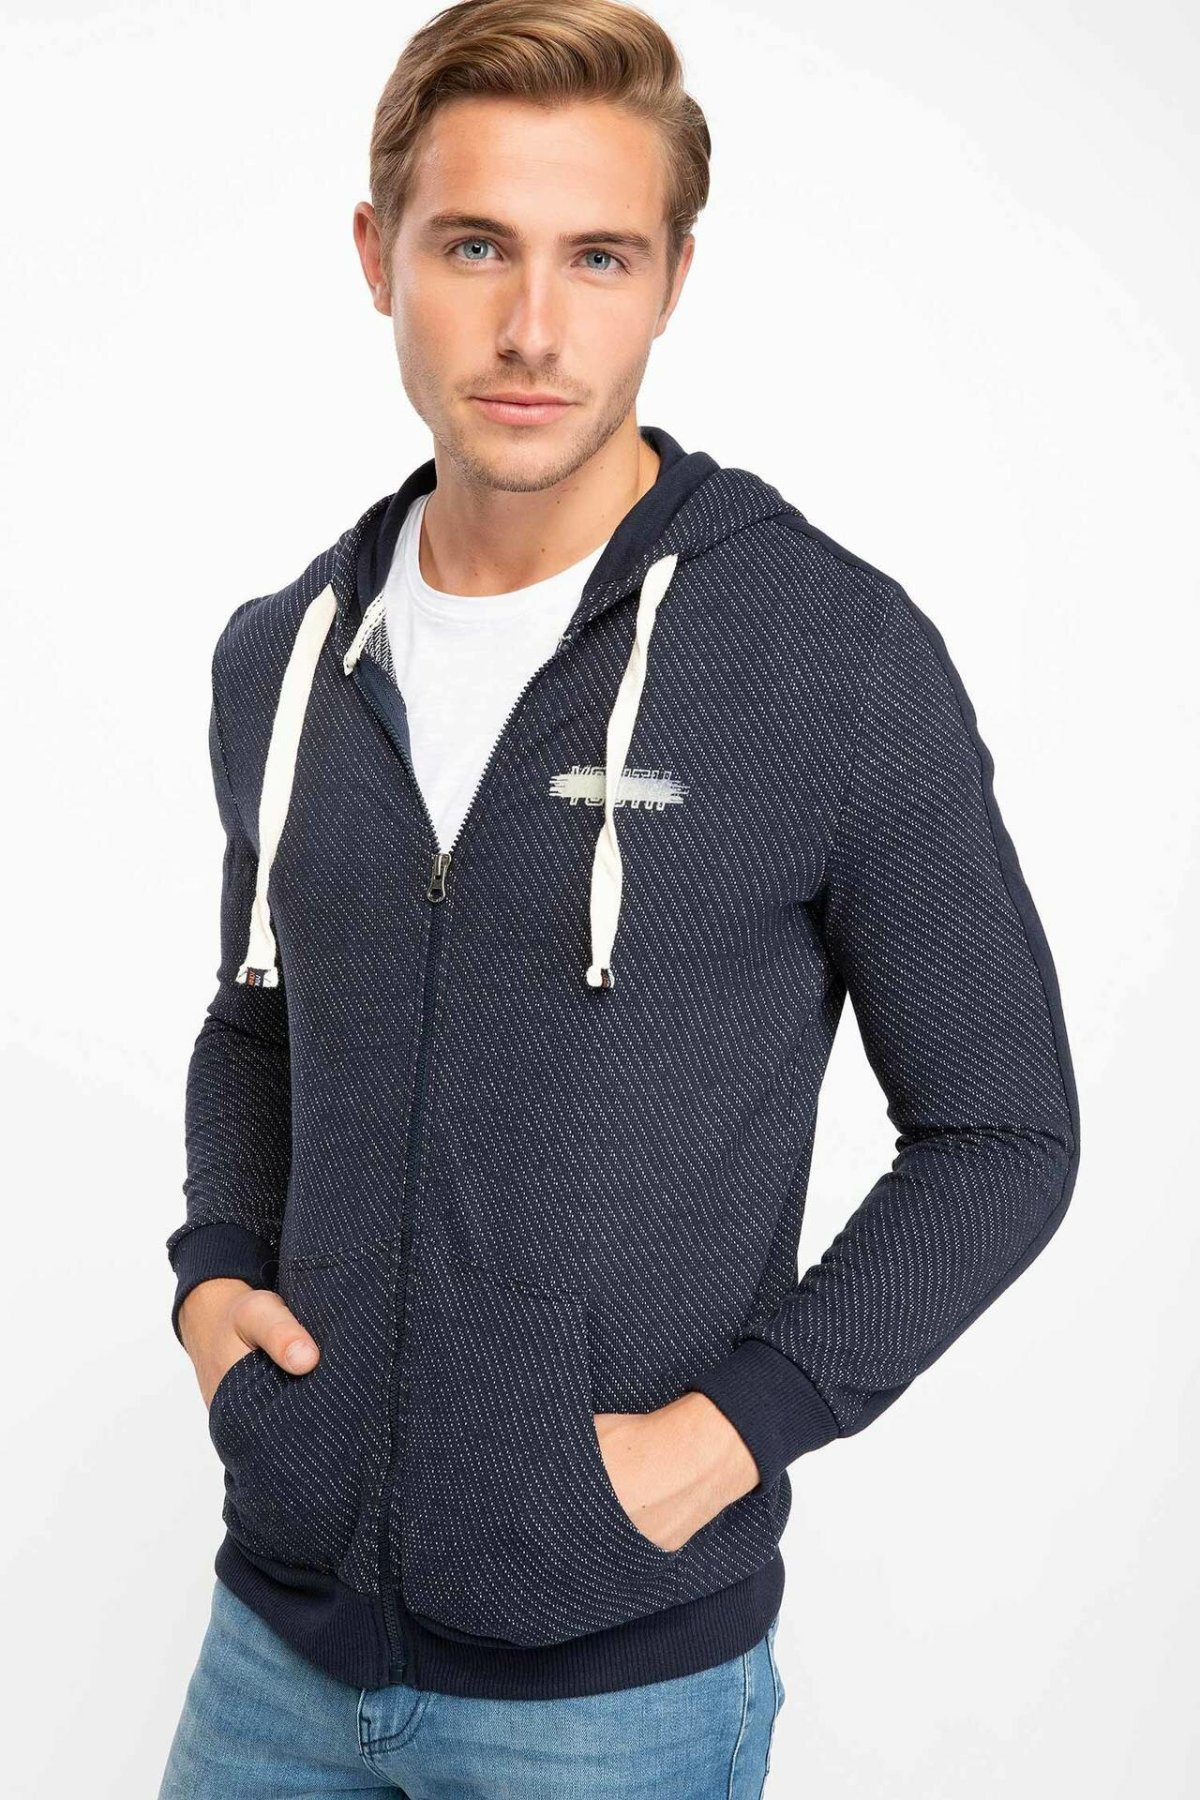 DeFacto Man Autumn Casual Long Sleeve Sportscoats Men Hooded Cardigan / Bolero Tops For Spring-J0577AZ18AU